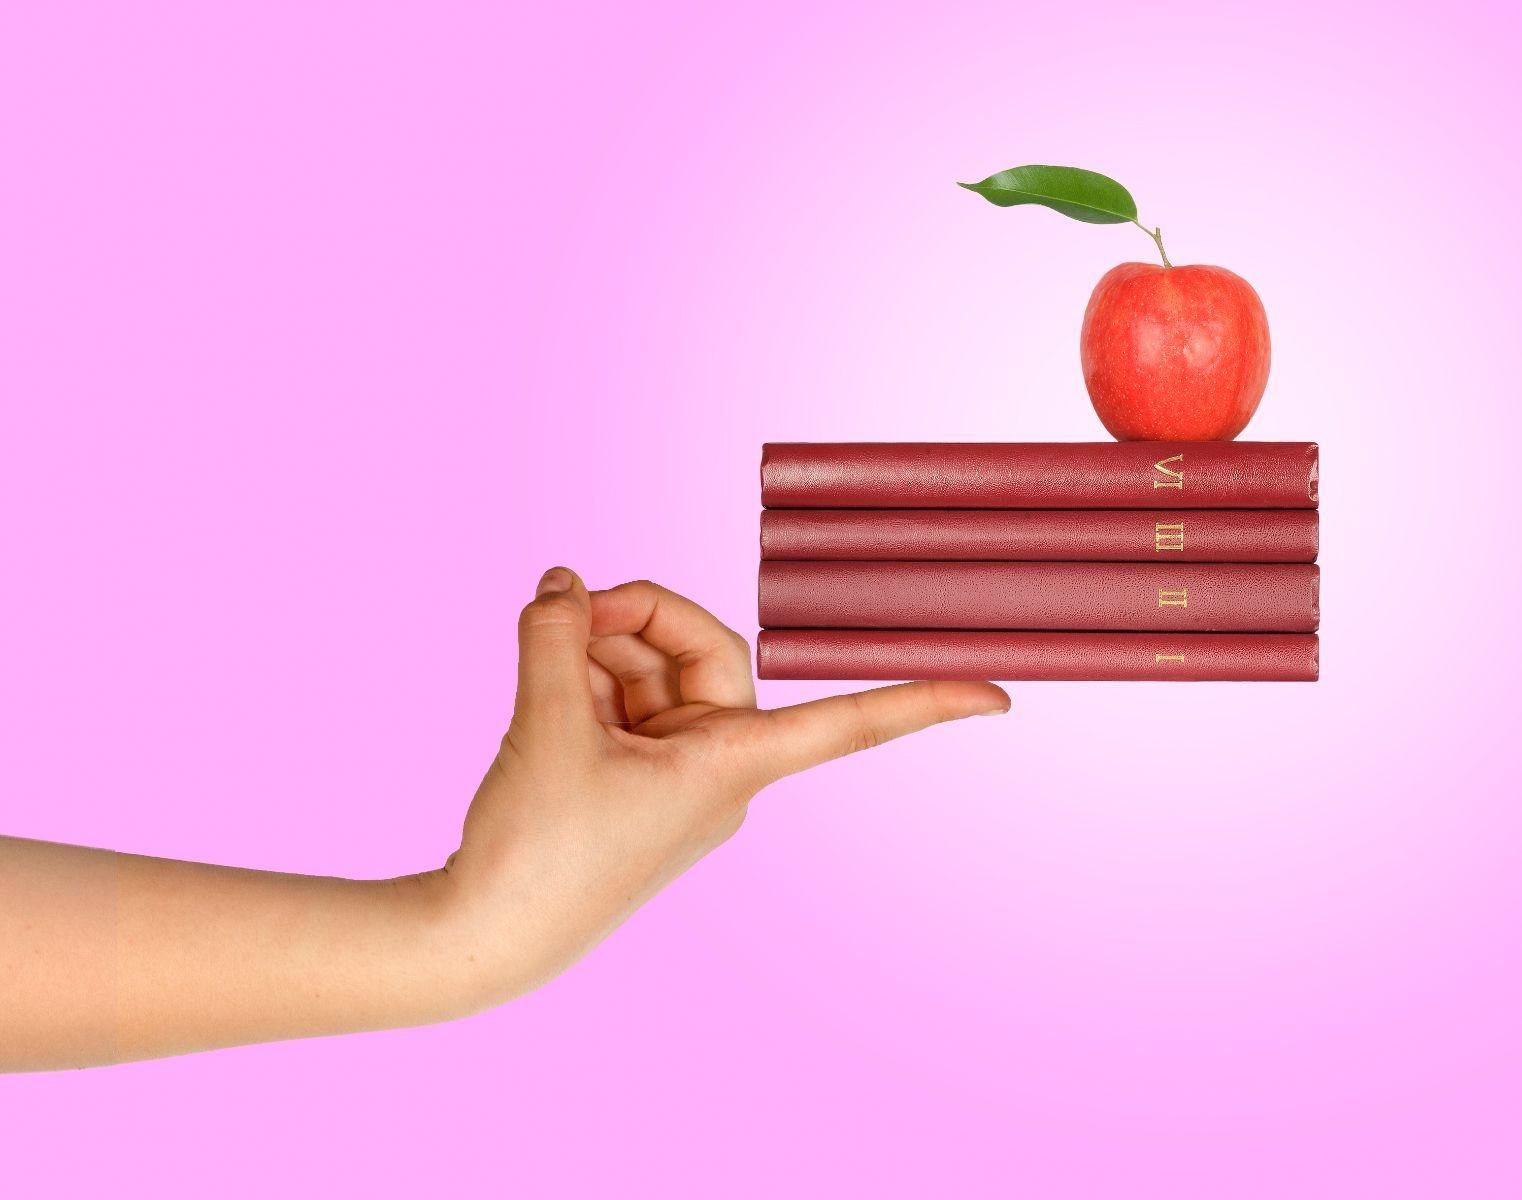 Mujer sosteniendo libros con una manzana